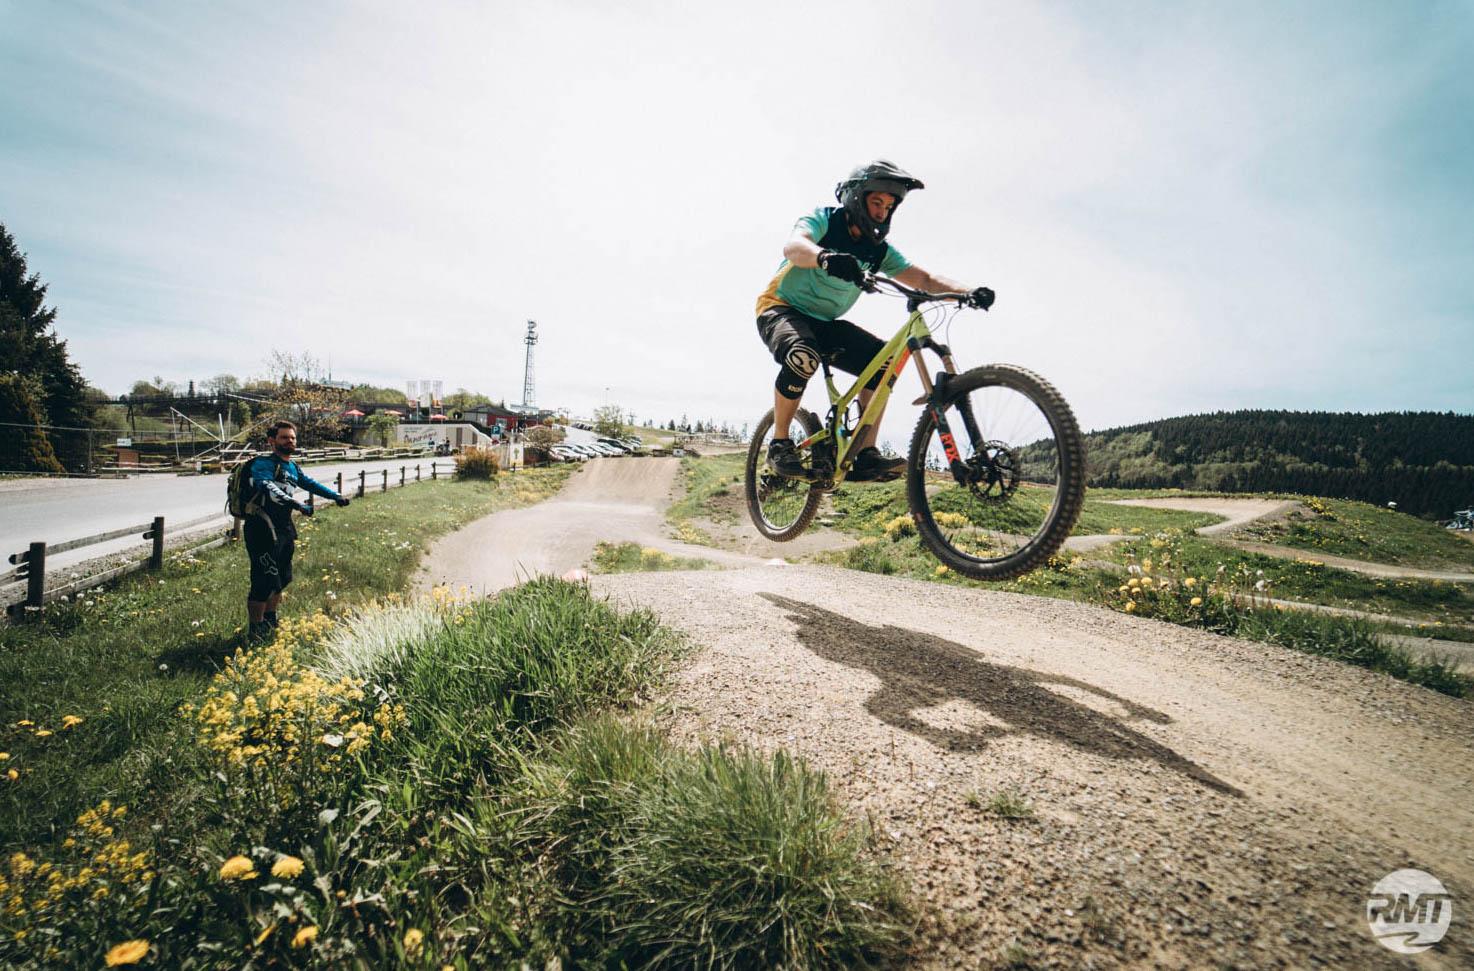 MTB Sprung & Drop Kurs im Trailpark Erbeskopf - Fahrtechnik Training Rock my Trail Bikeschule - 12